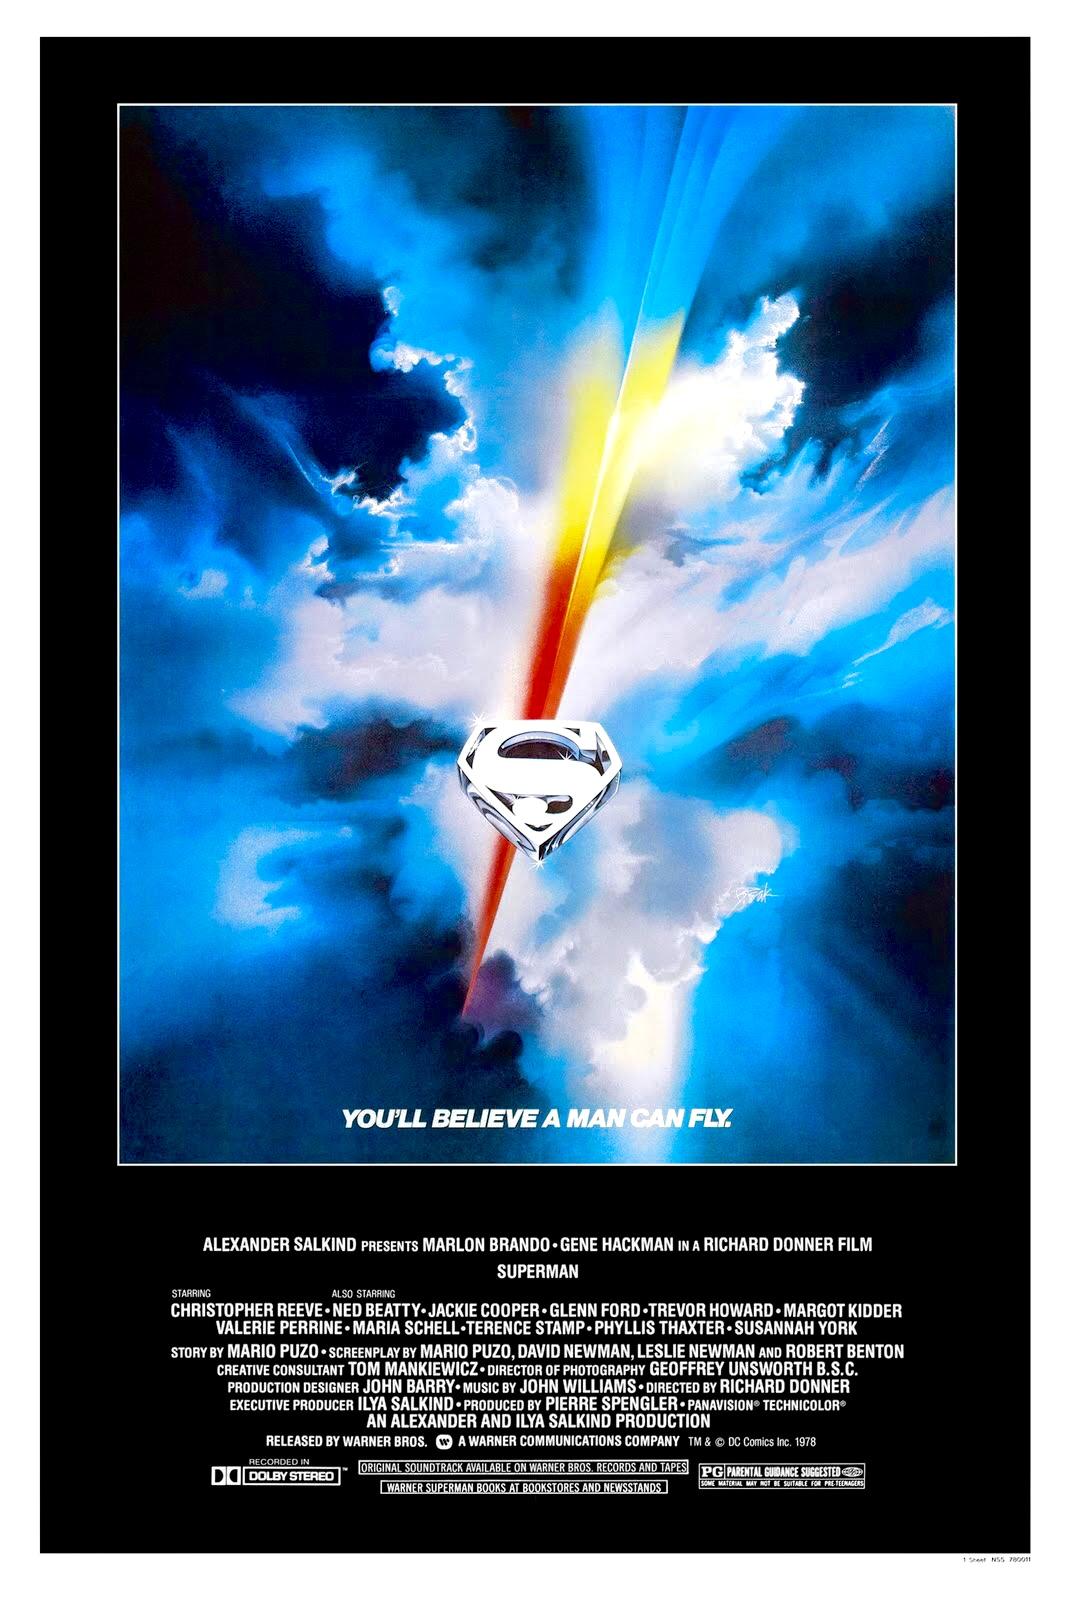 Superman (1978) BluRay 480p, 720p & 1080p